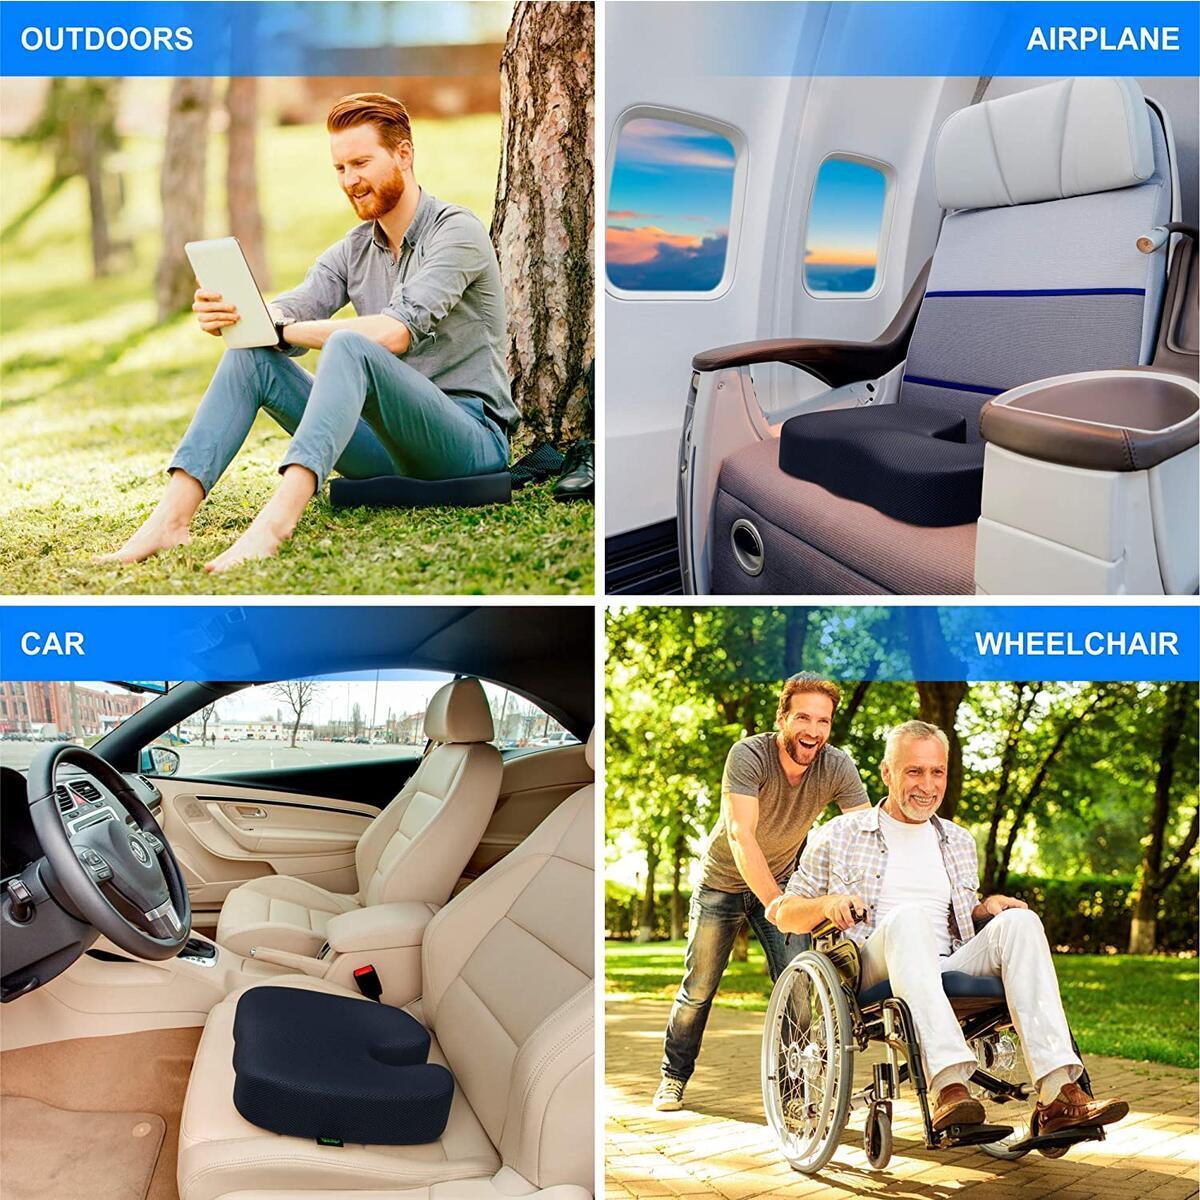 GRASSVERY Gel Pressure Relief Enhanced Office Chair Seat Cushion - Memory Foam Coccyx Cushion for Office Chair, Car, Desk, Wheelchair – Contoured Orthopedic Memory Foam Pain Relief Chair Pad (Black)